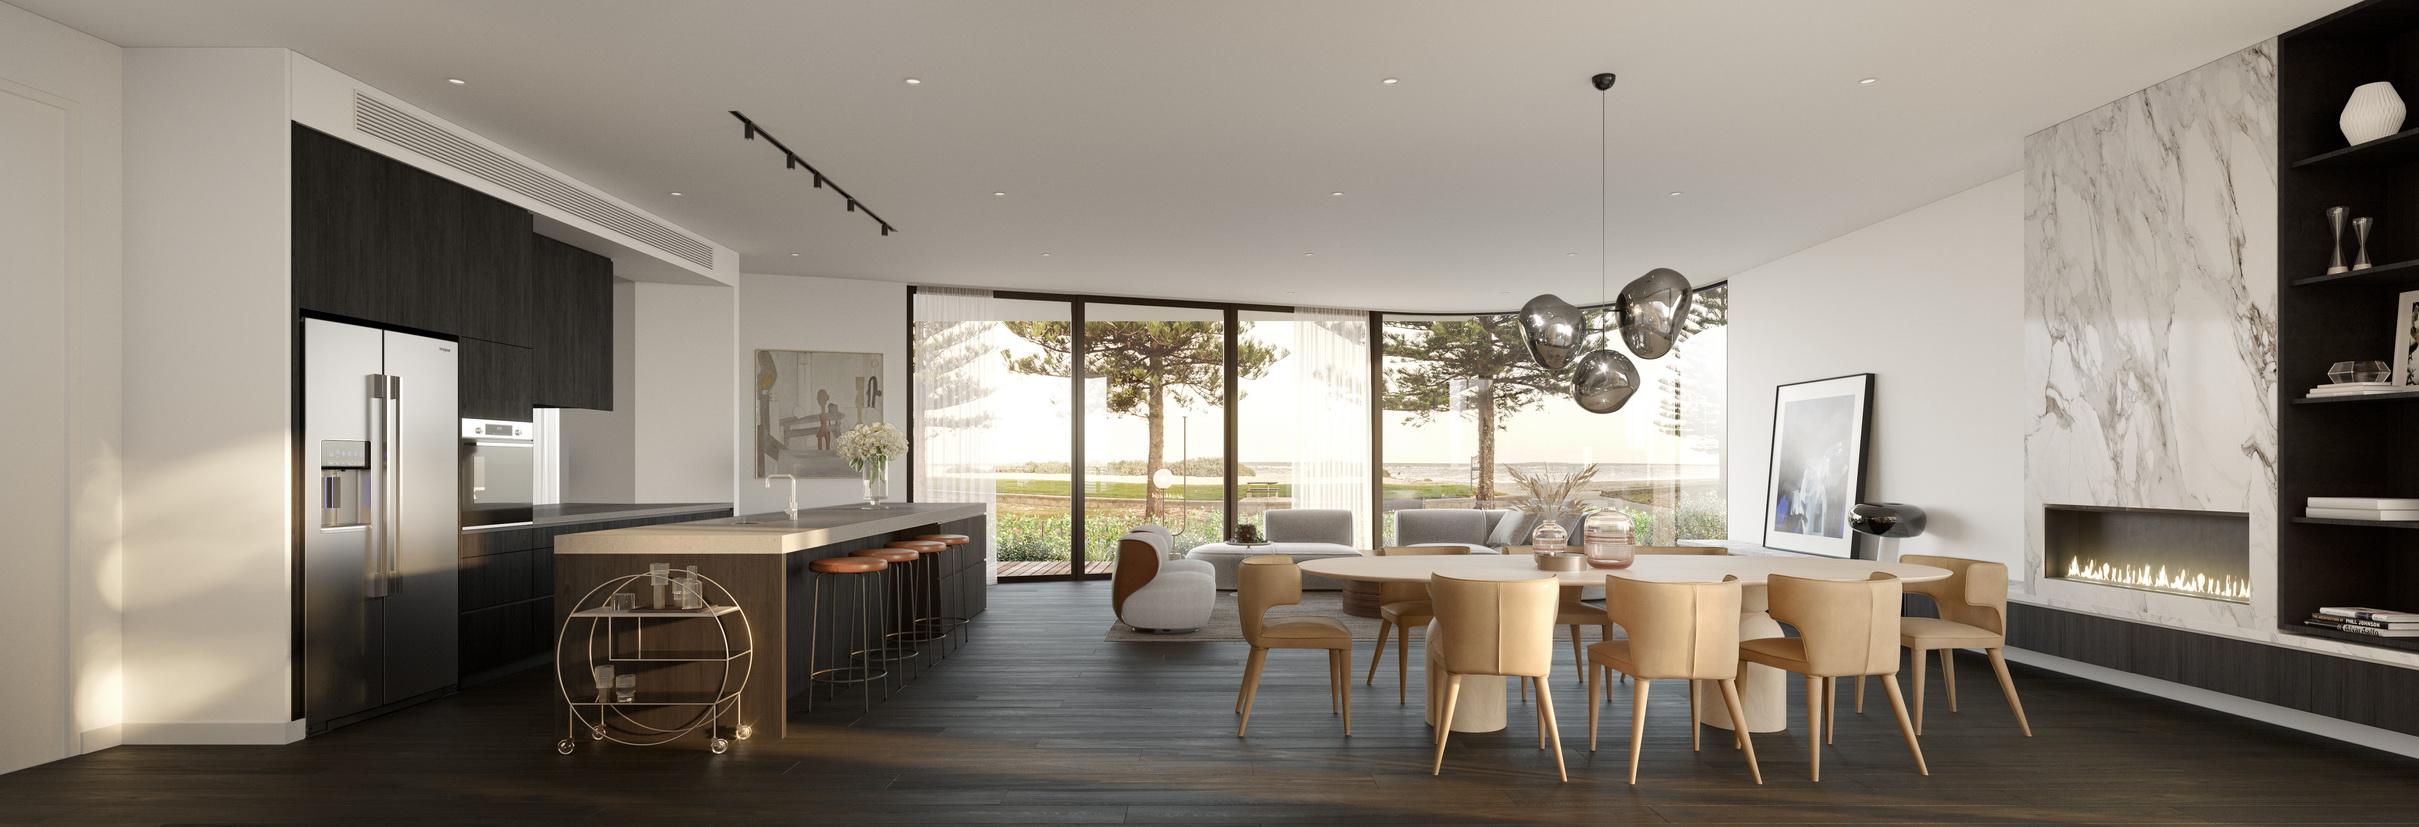 Mancini-Esplanade-3D-image-visualisation-living-kitchen